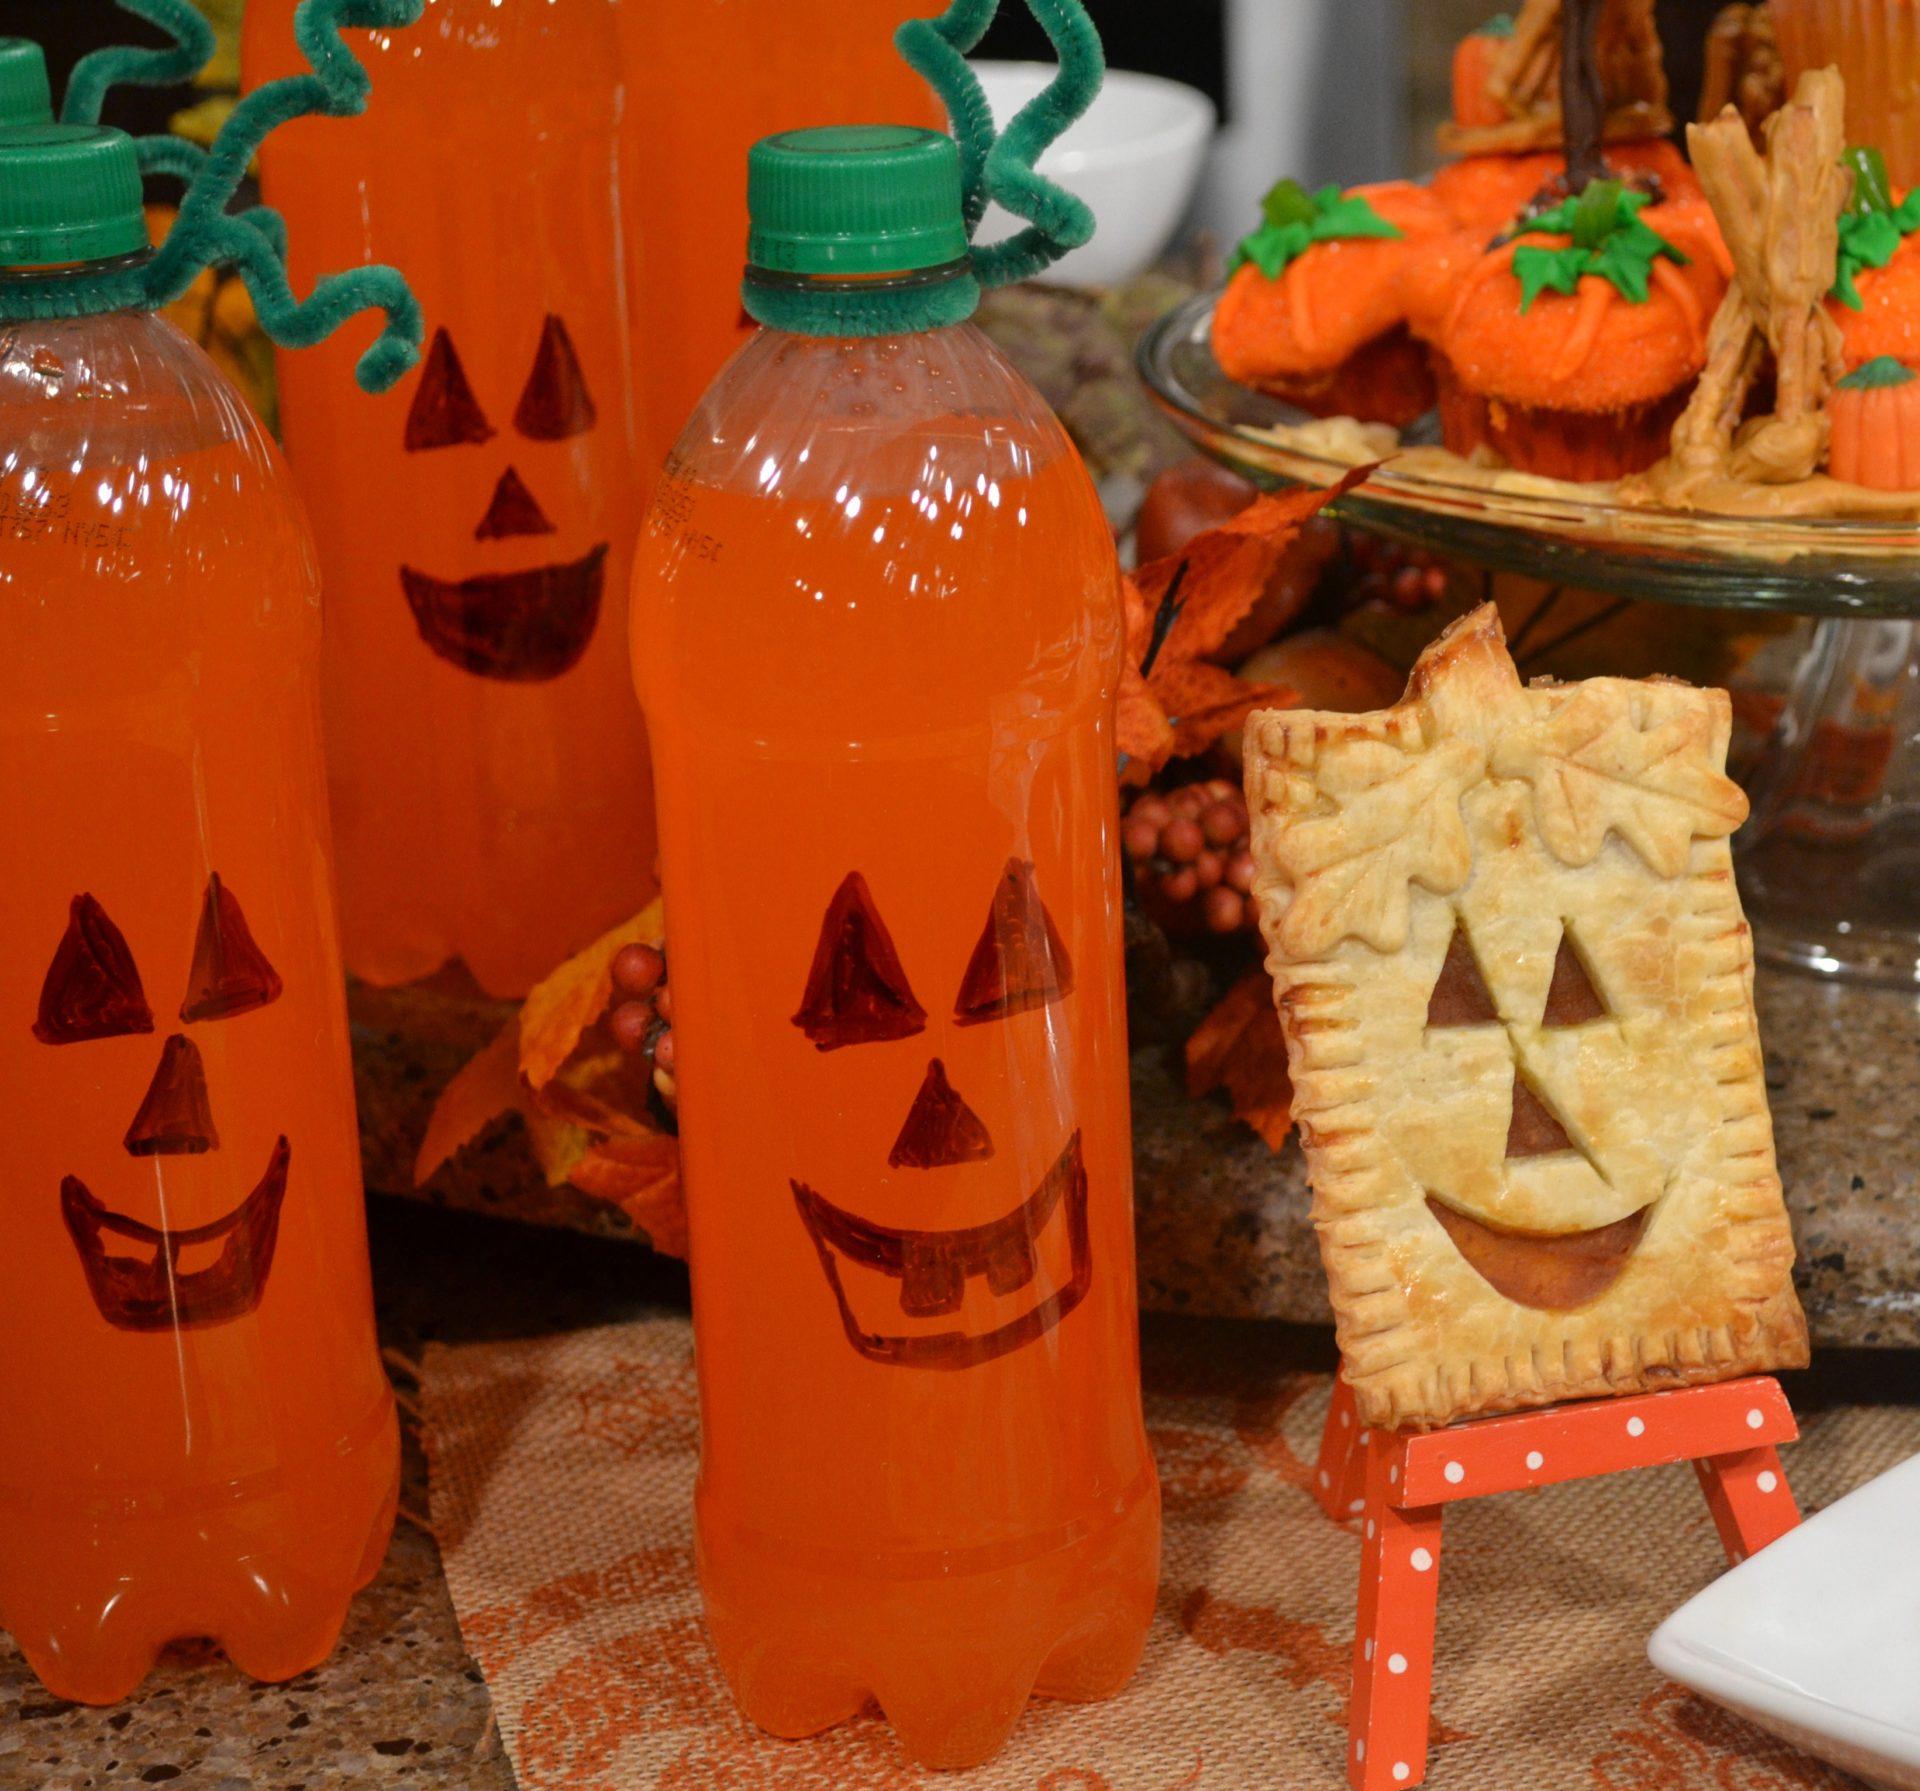 Pumpkin Pop Tarts and Orange Drinks